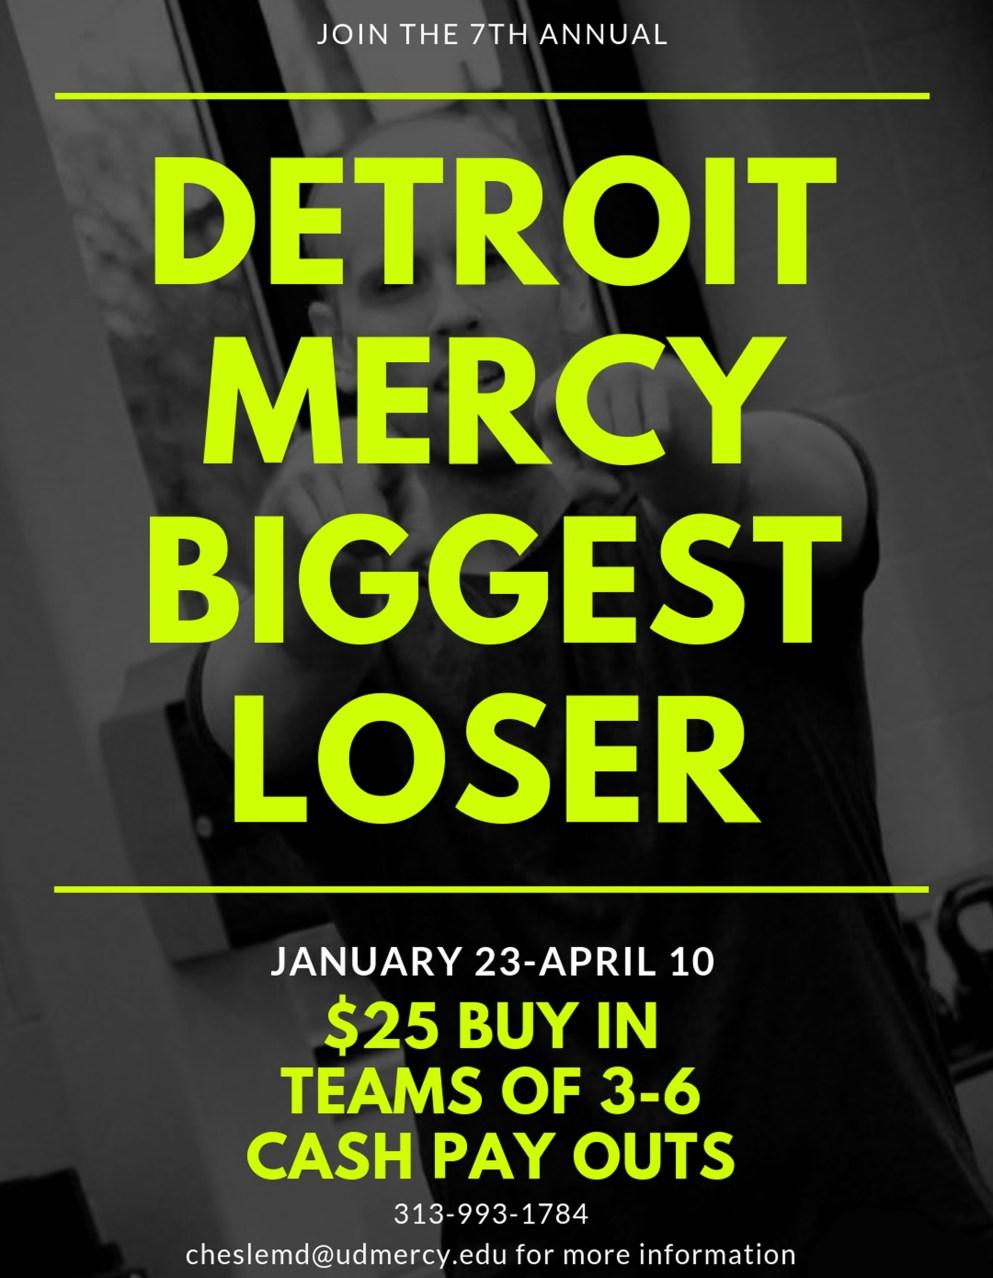 Detroit Mercy Biggest Loser competition